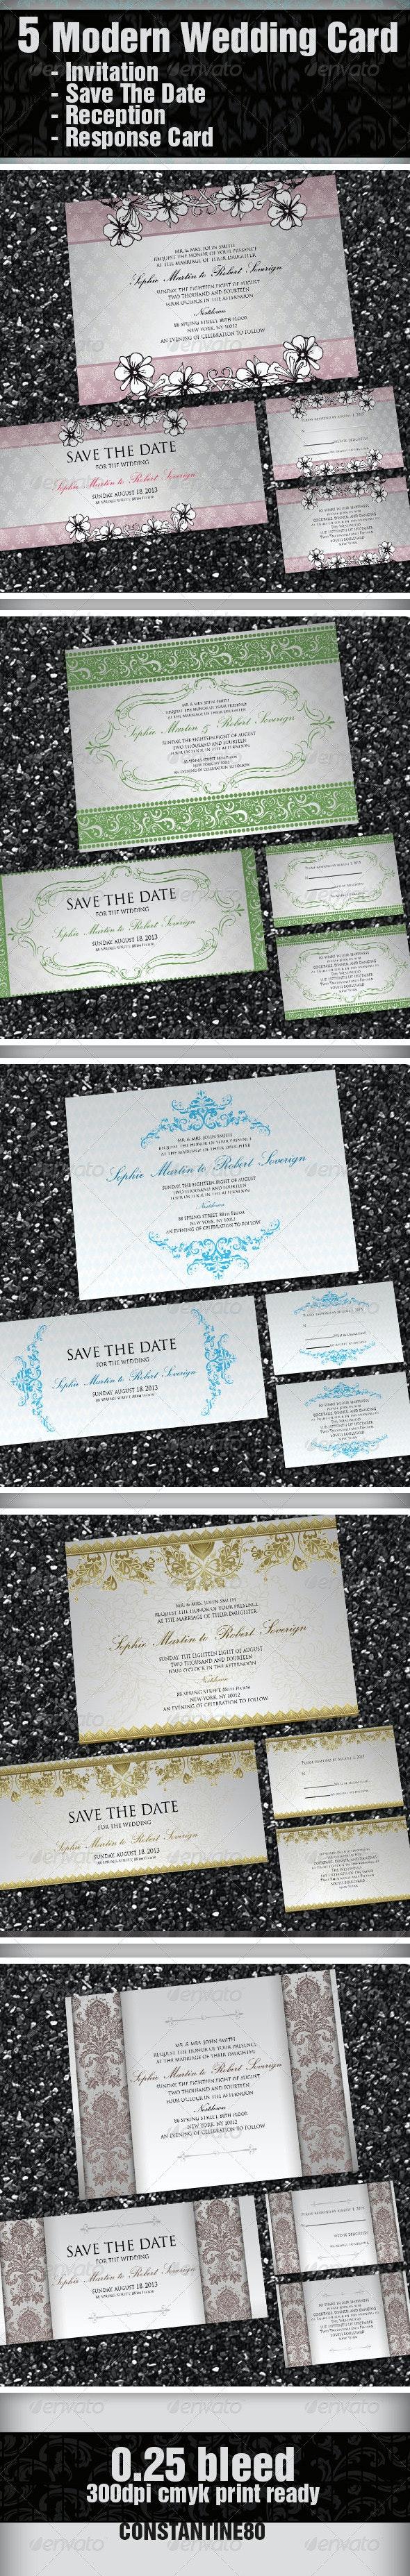 5 Items Modern Wedding Card - Weddings Cards & Invites